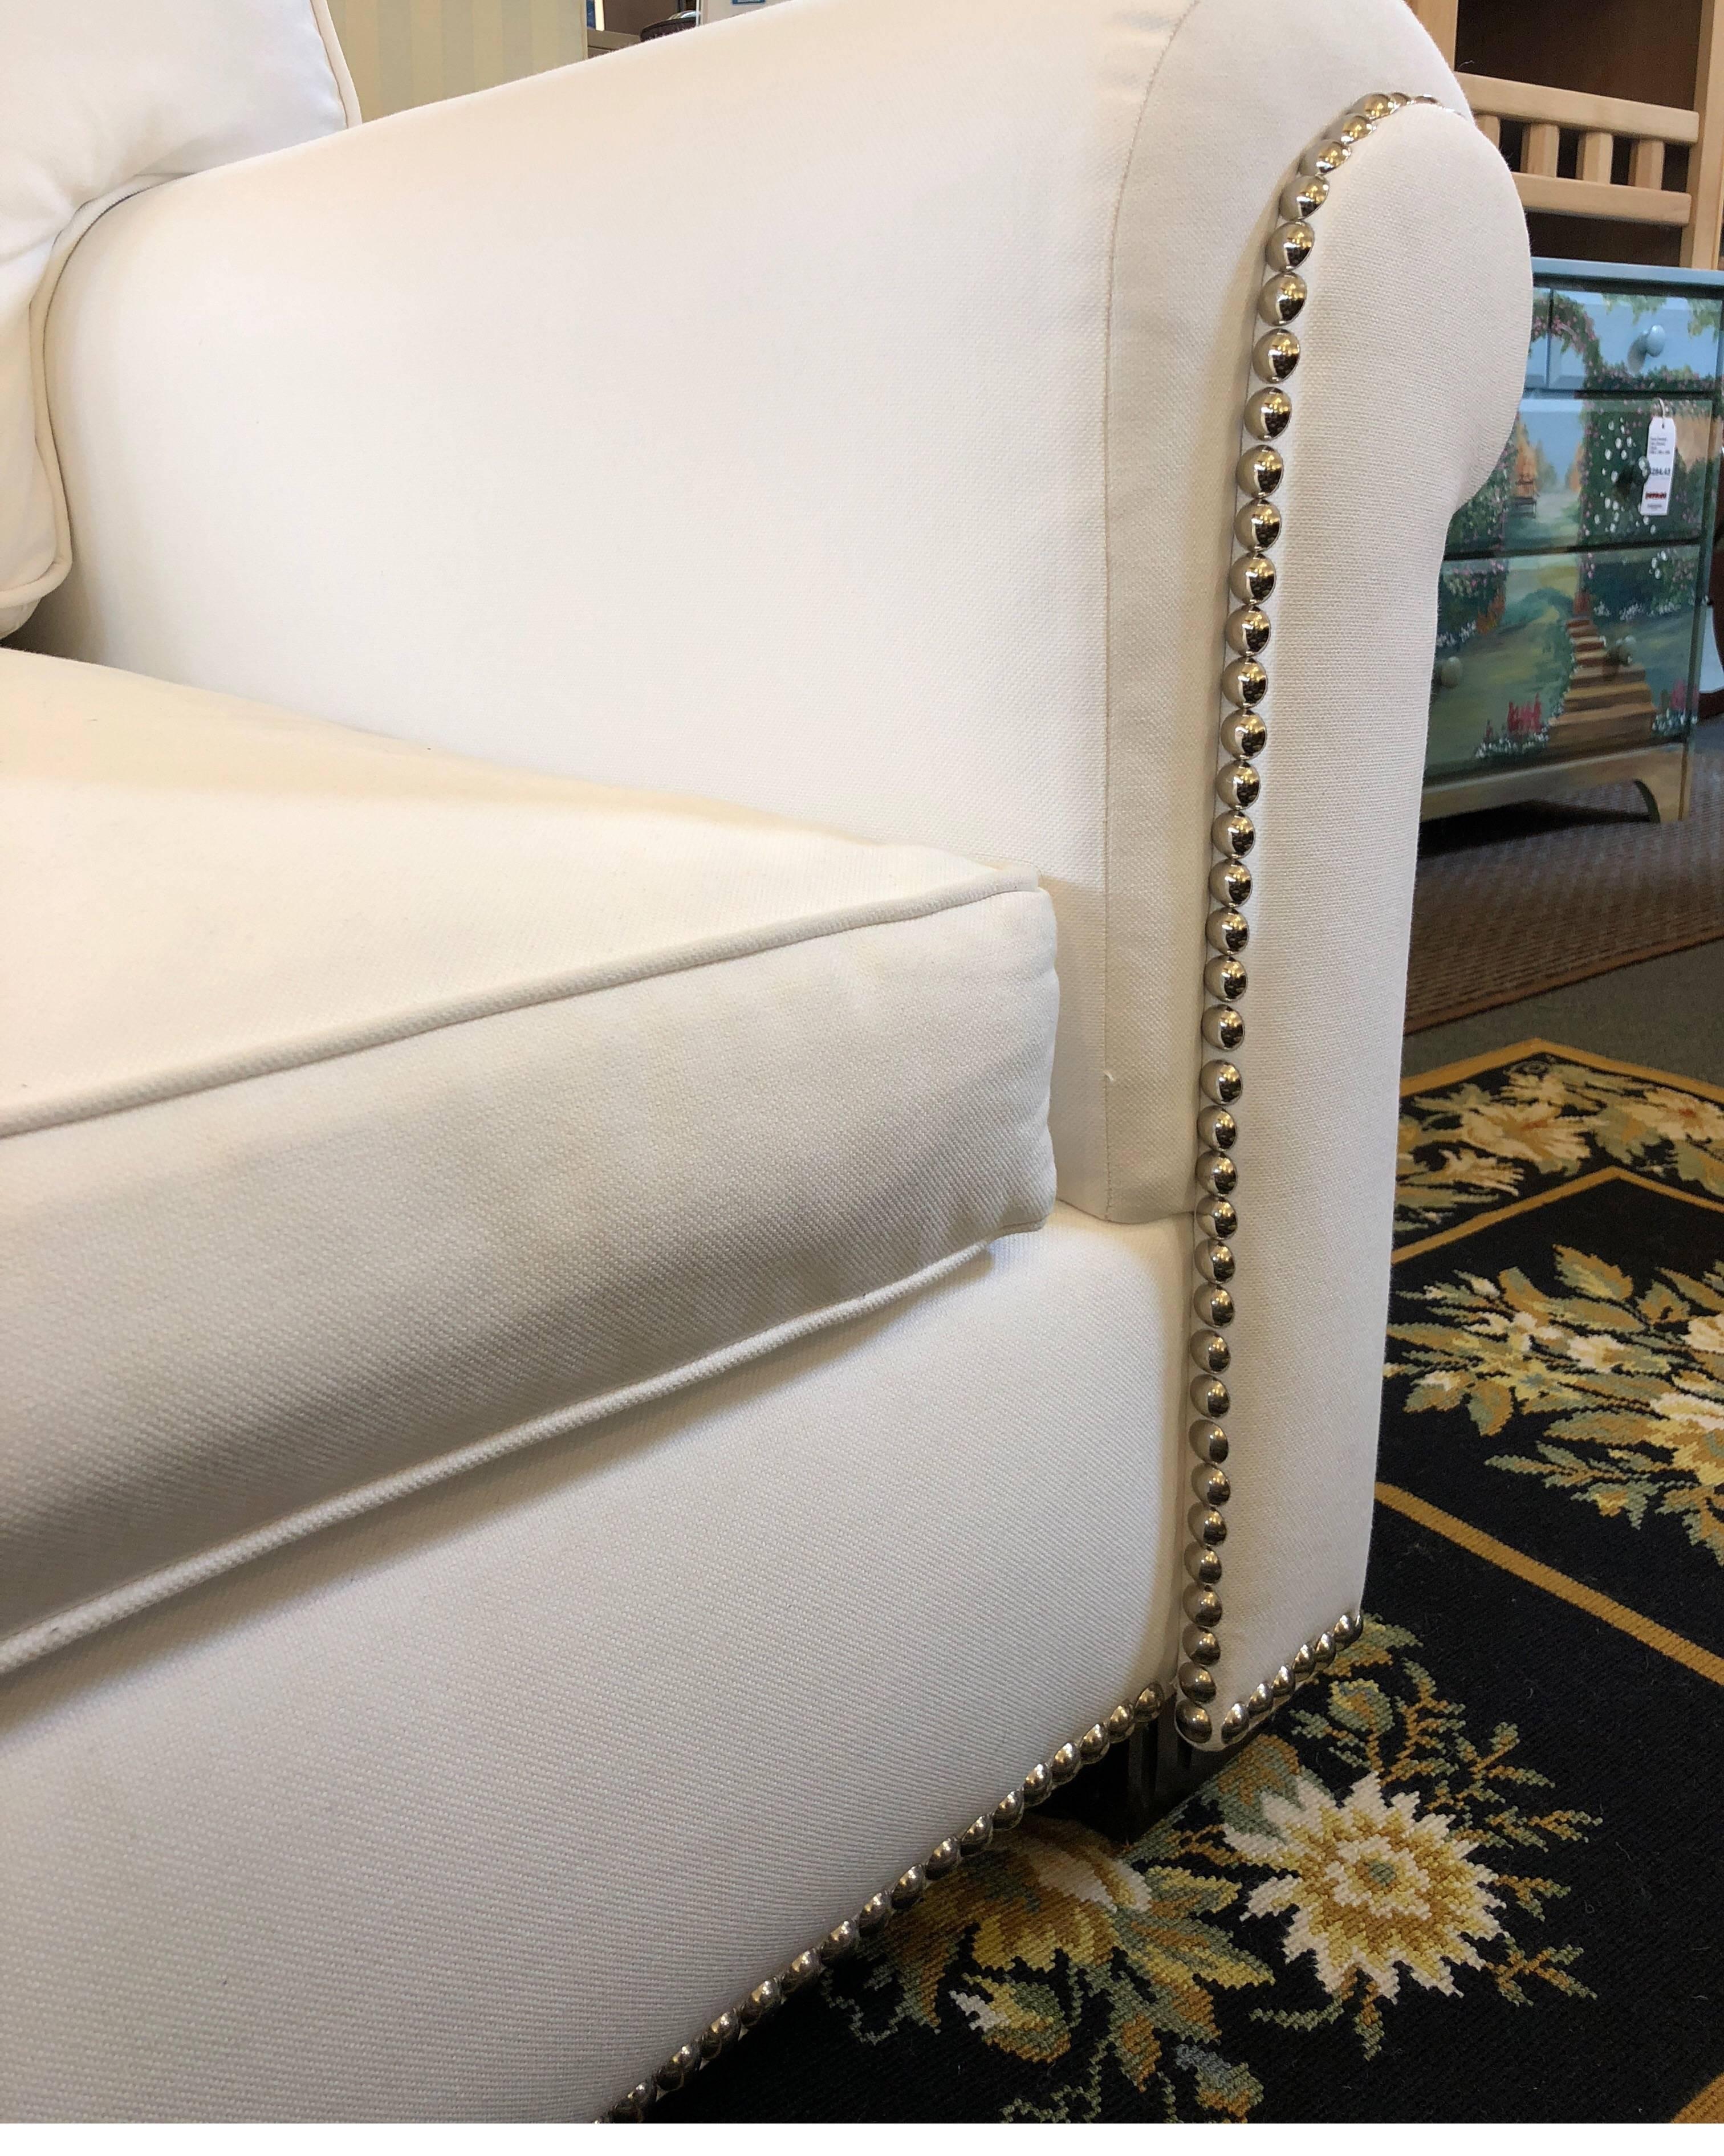 Excellent Ralph Lauren Jamaica Salon Sofa For Sale At 1Stdibs Andrewgaddart Wooden Chair Designs For Living Room Andrewgaddartcom